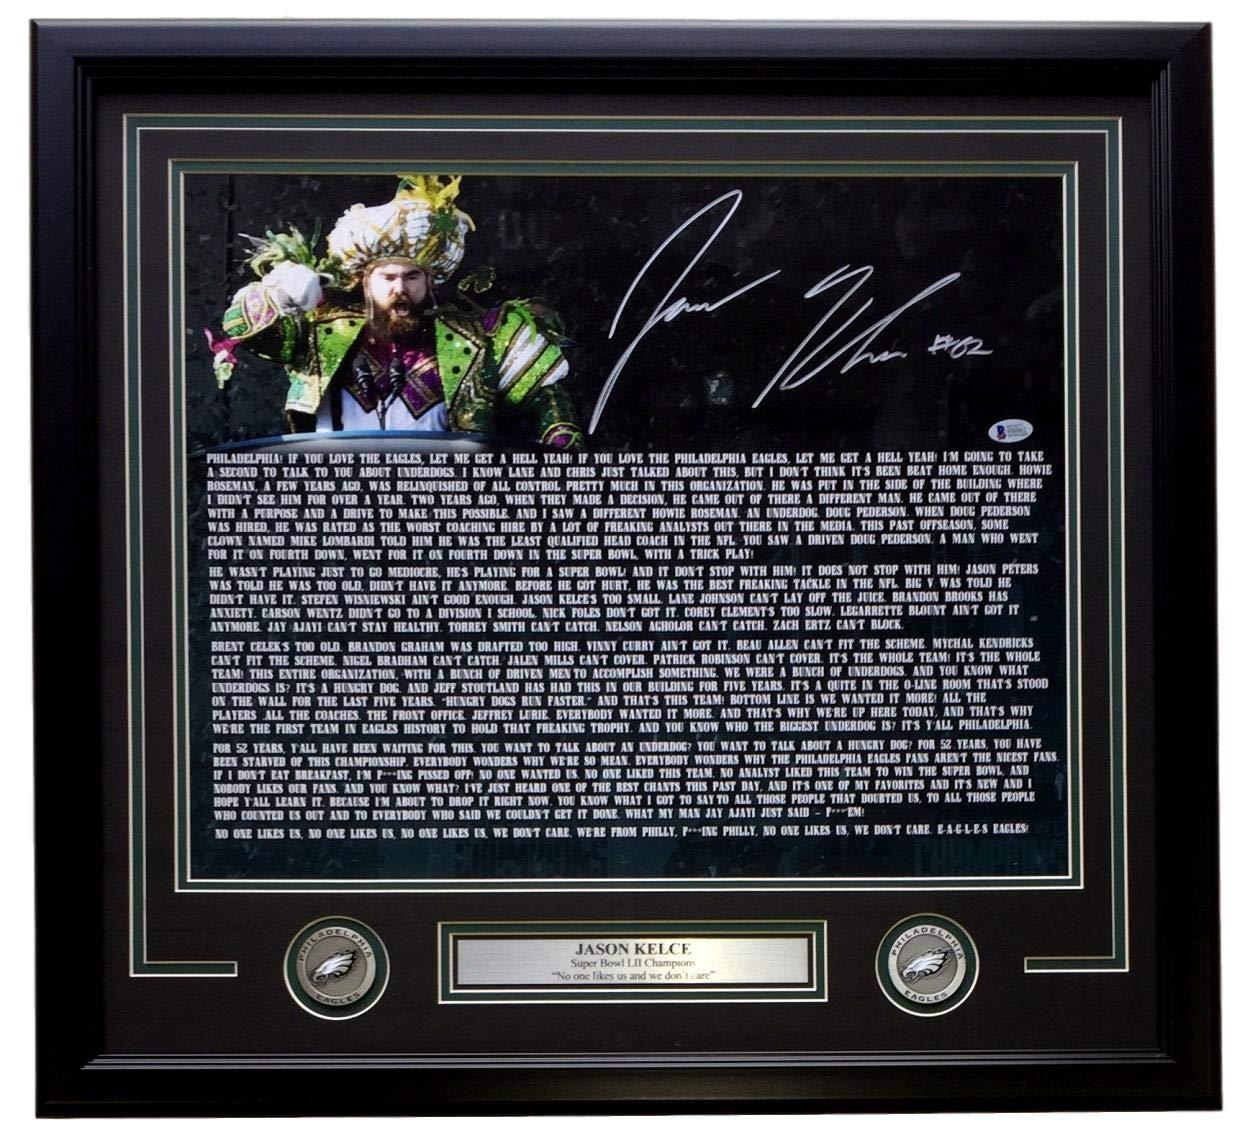 Jason Kelce Signed Framed 16x20 Eagles Super Bowl 52 Speech Transcript Photo Beckett